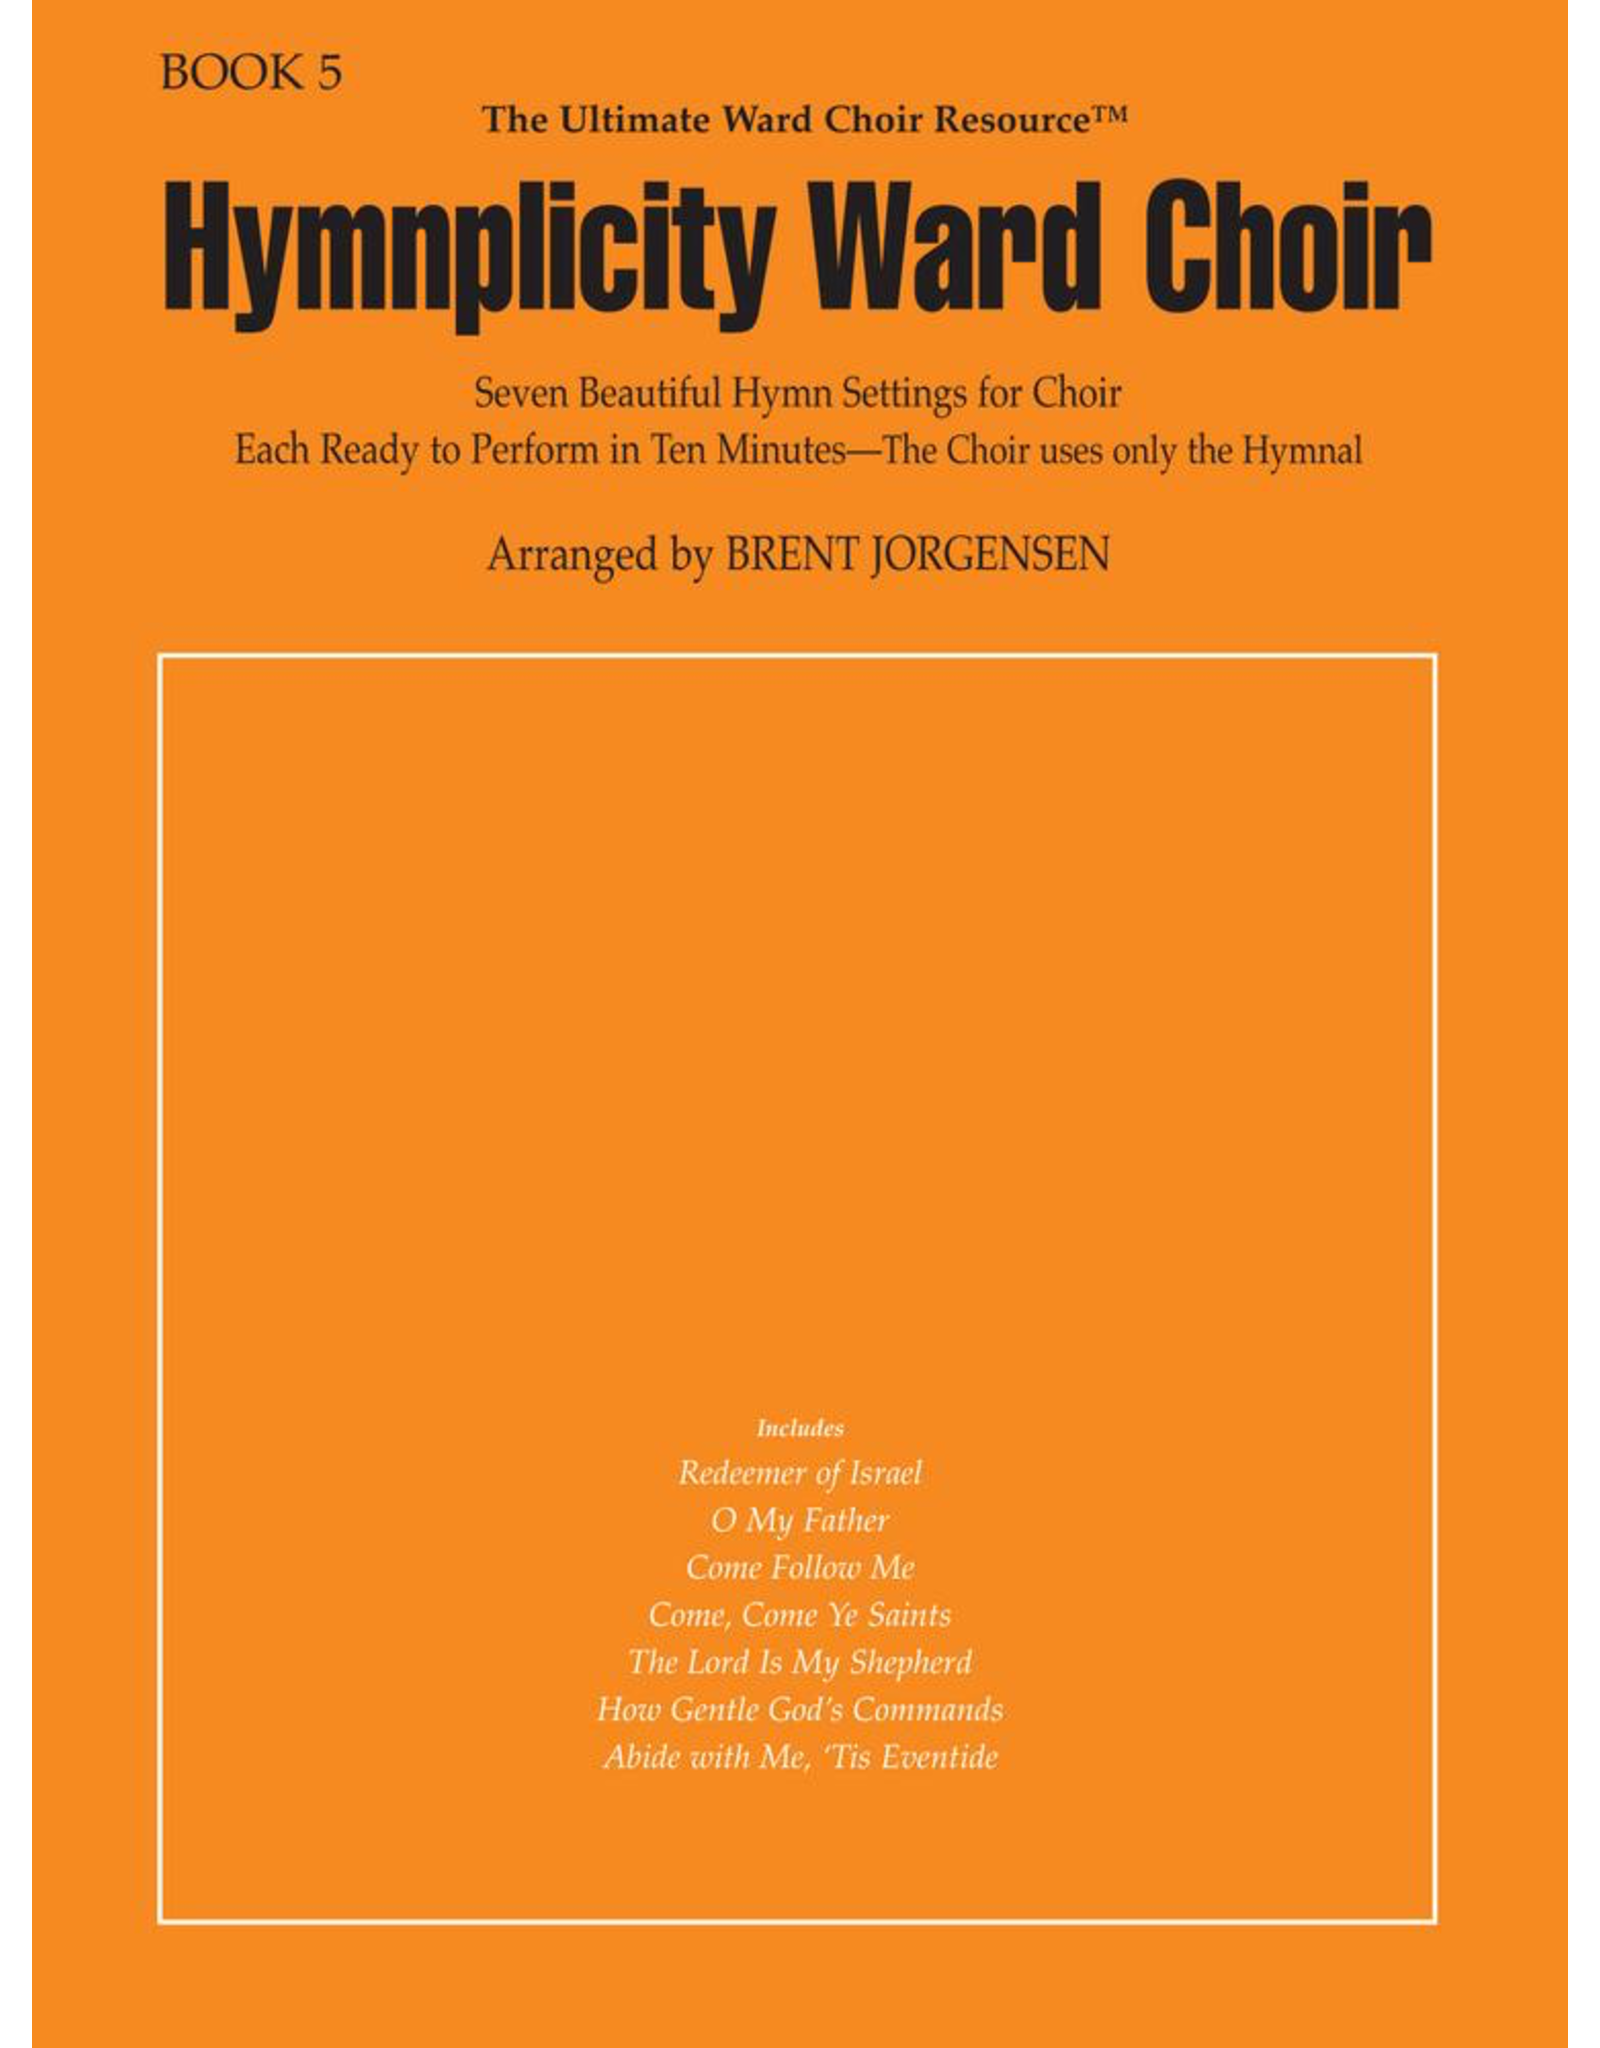 Jackman Music Hymnplicity Ward Choir Book 5